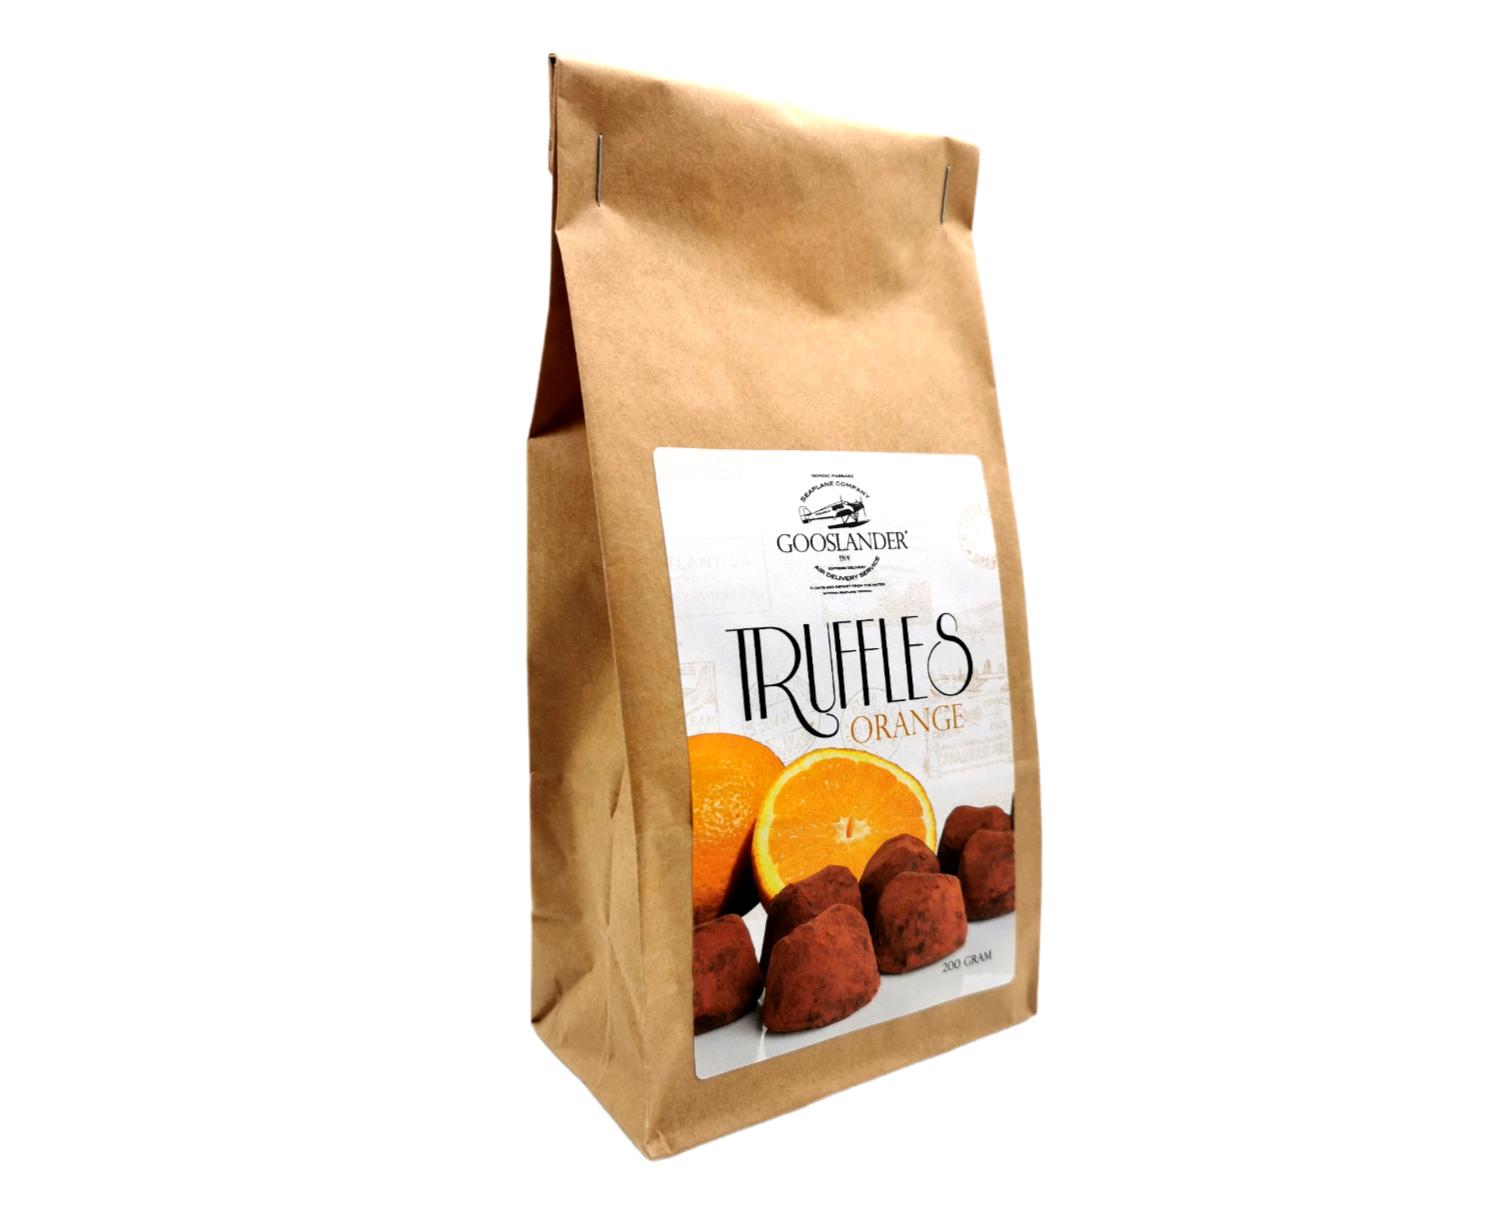 Chokladtryfflar Apelsin 200 g